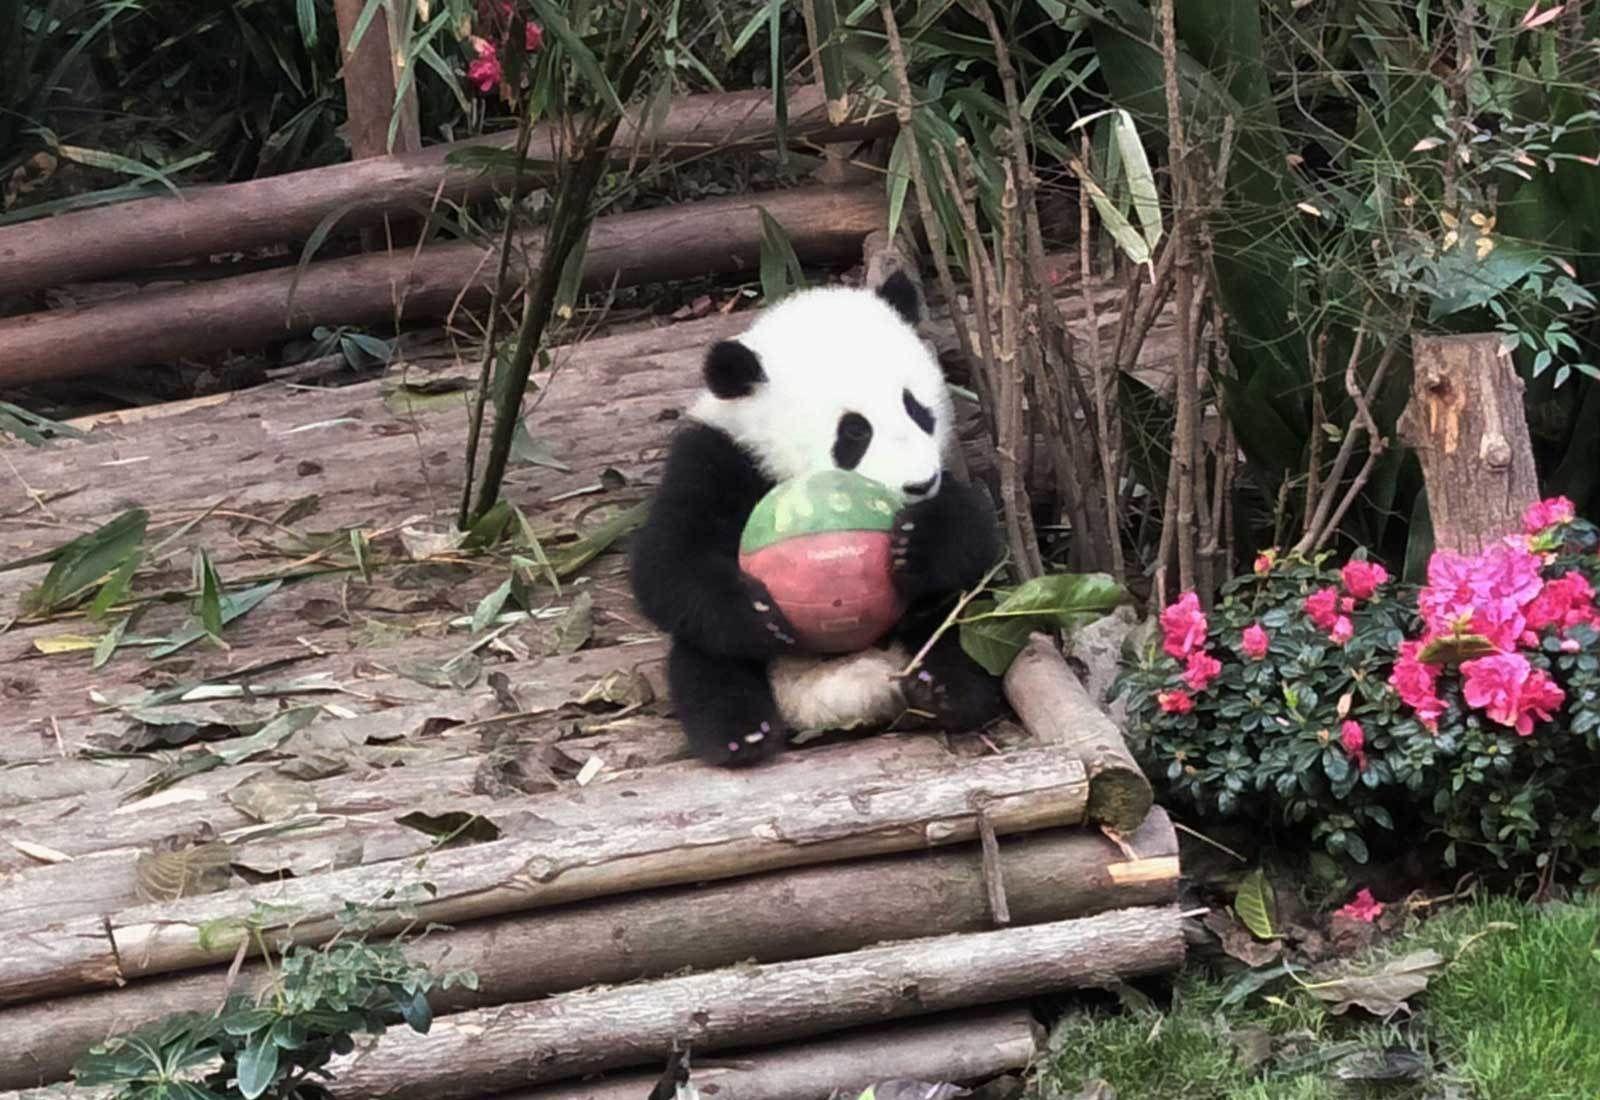 Best-Panda-Photo-(1).jpg